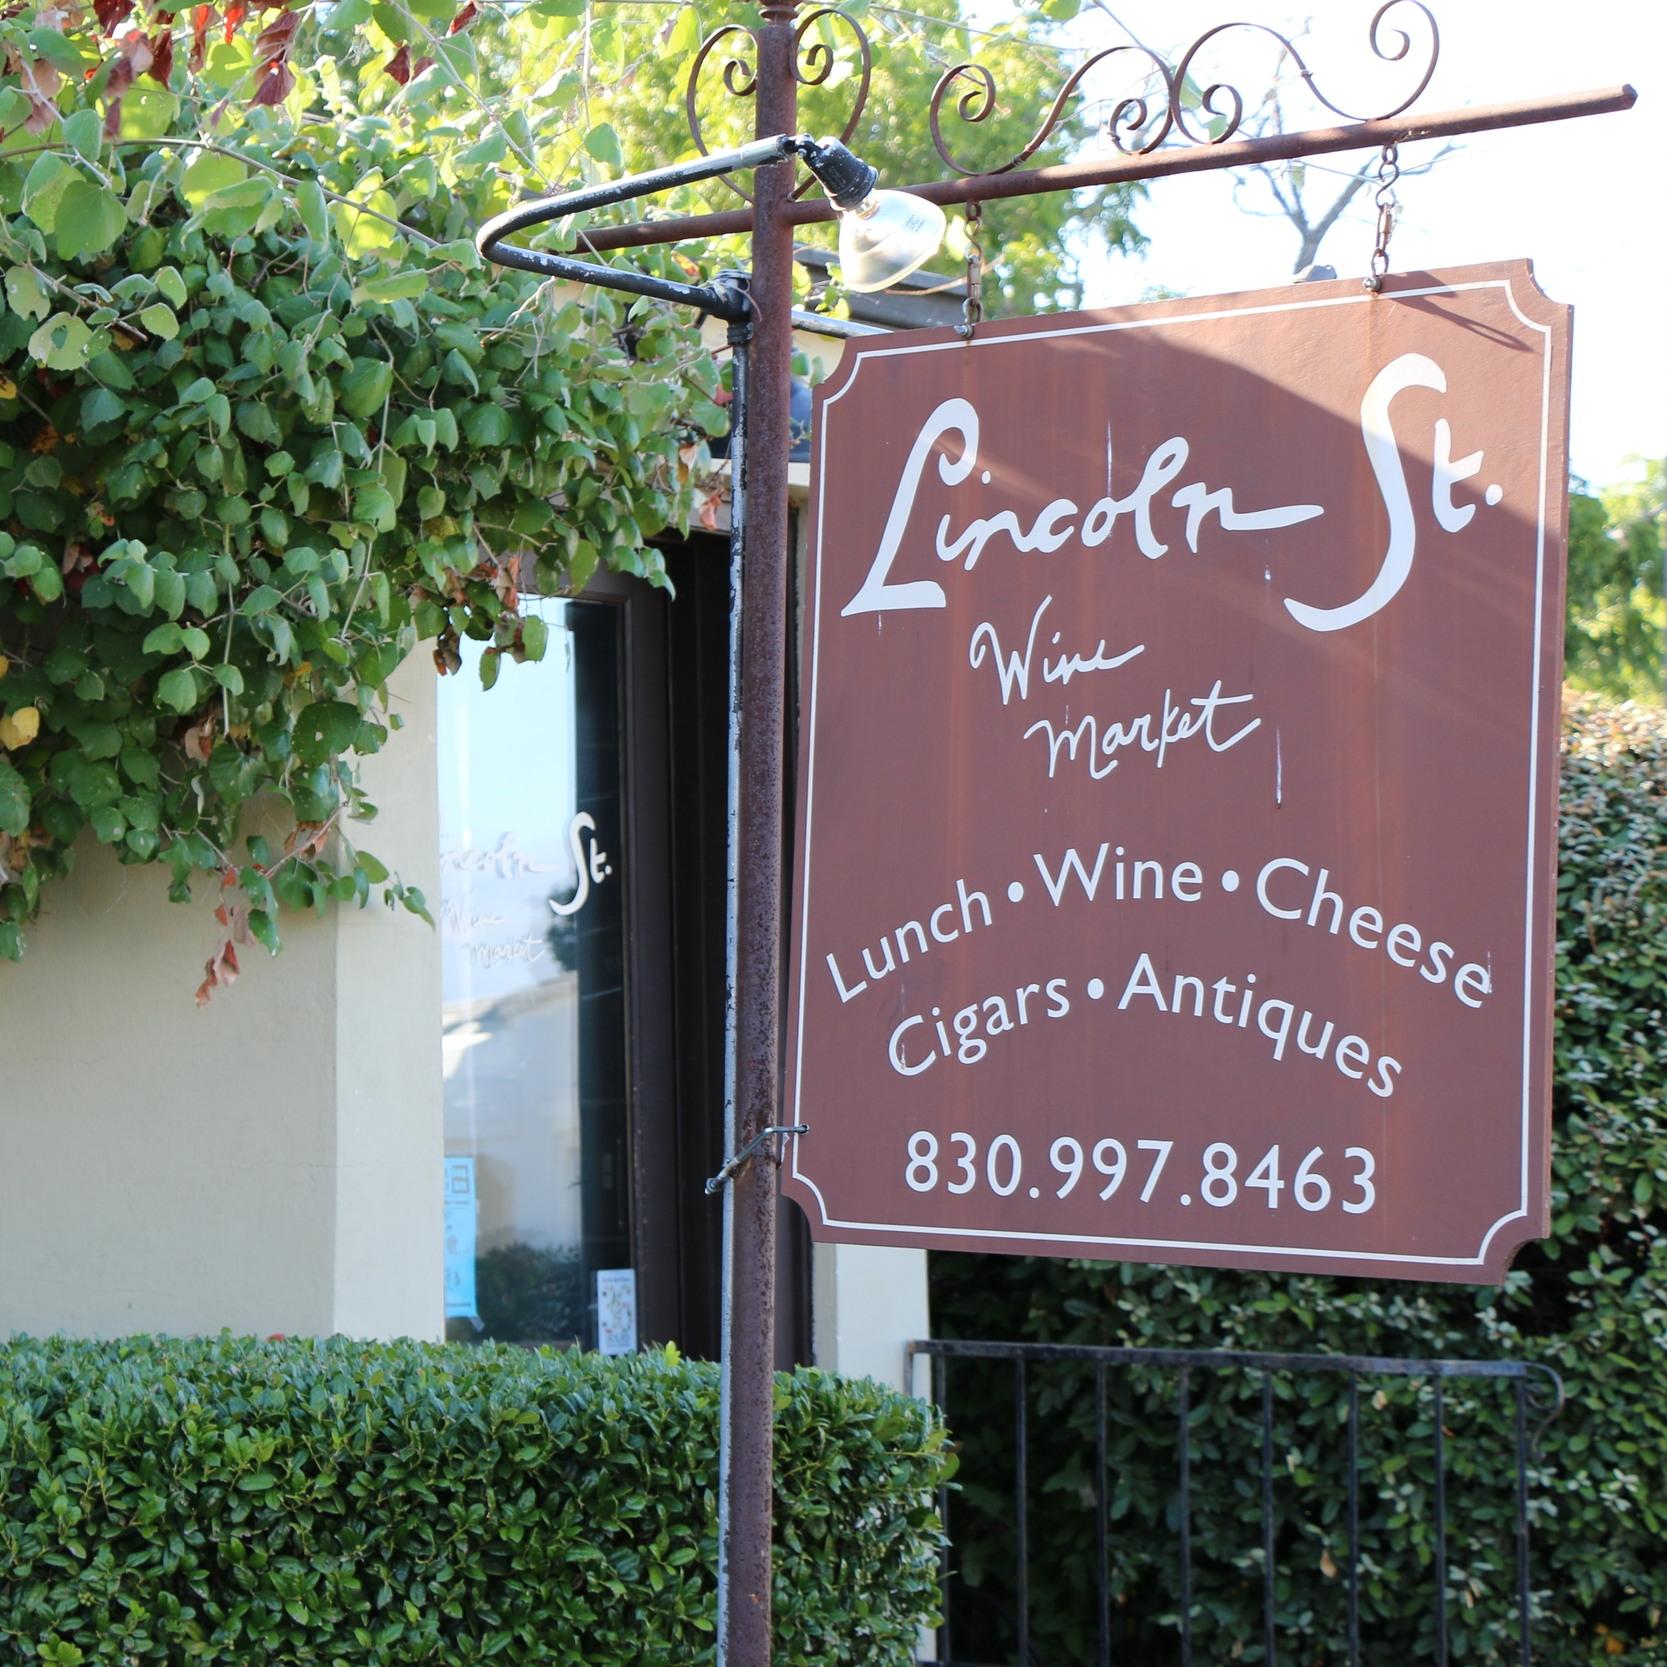 LINCOLN STREET WINE MARKET